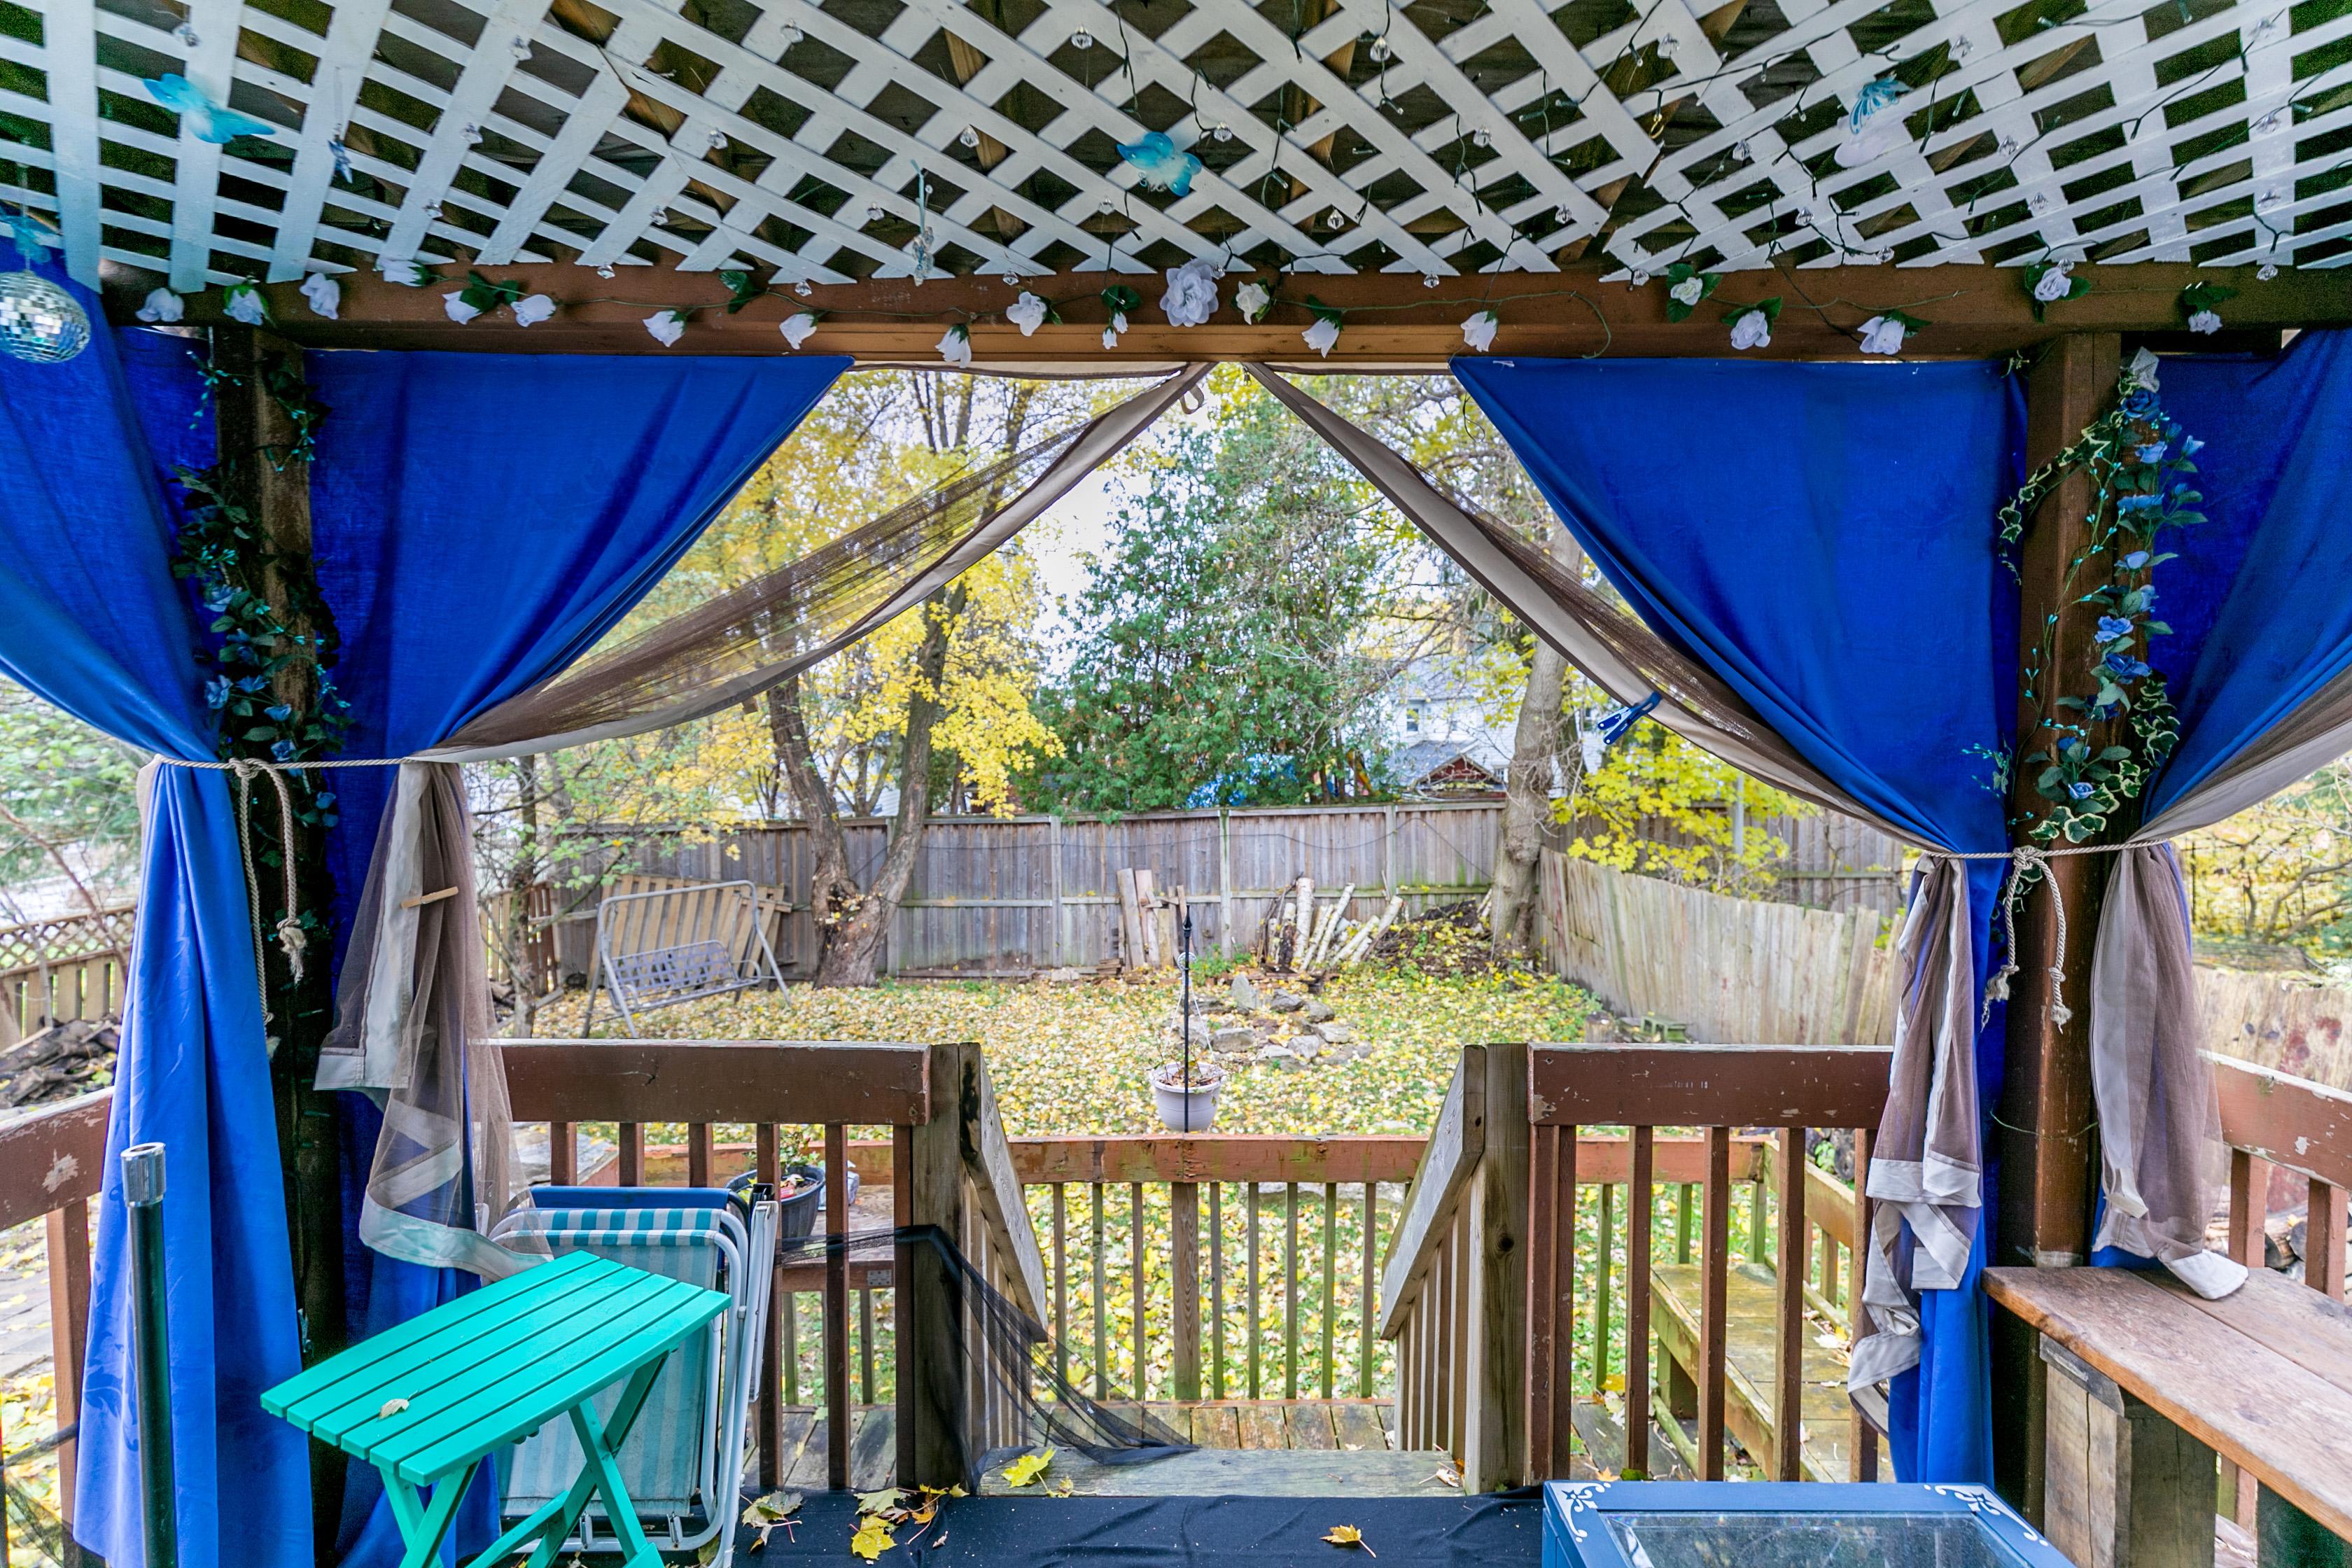 http://listingtour.s3-website-us-east-1.amazonaws.com/285-prospect-street/285ProspectStreet-129.jpg